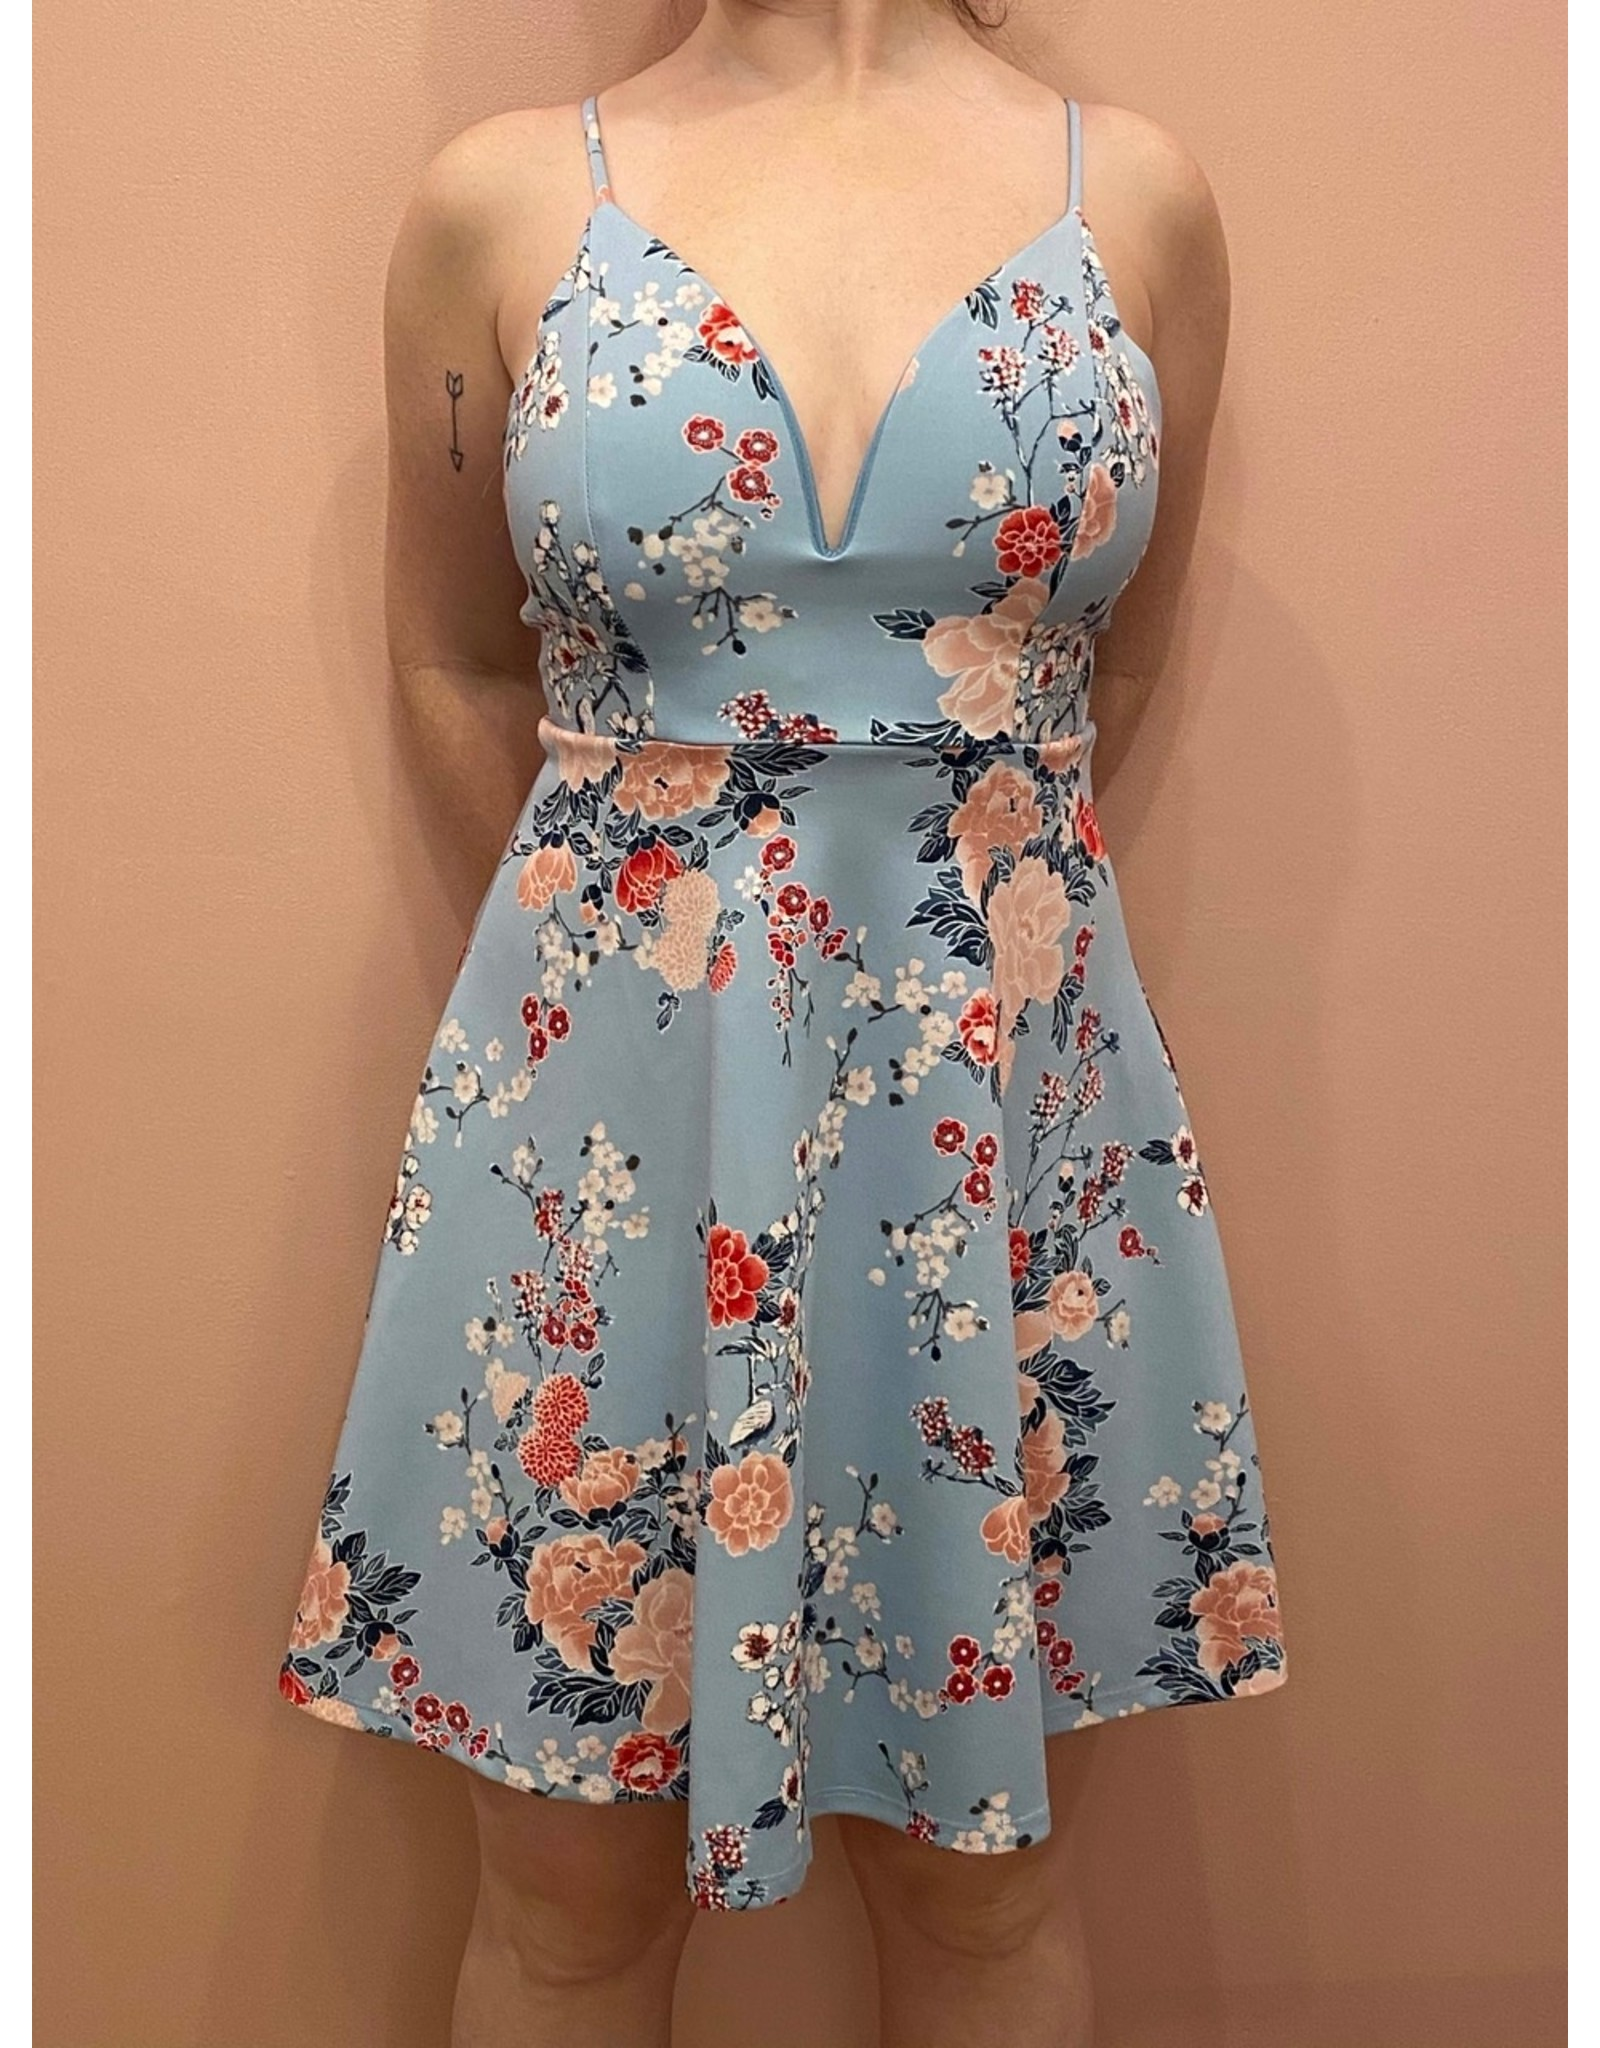 Bonanza - Blossom Floral Dress